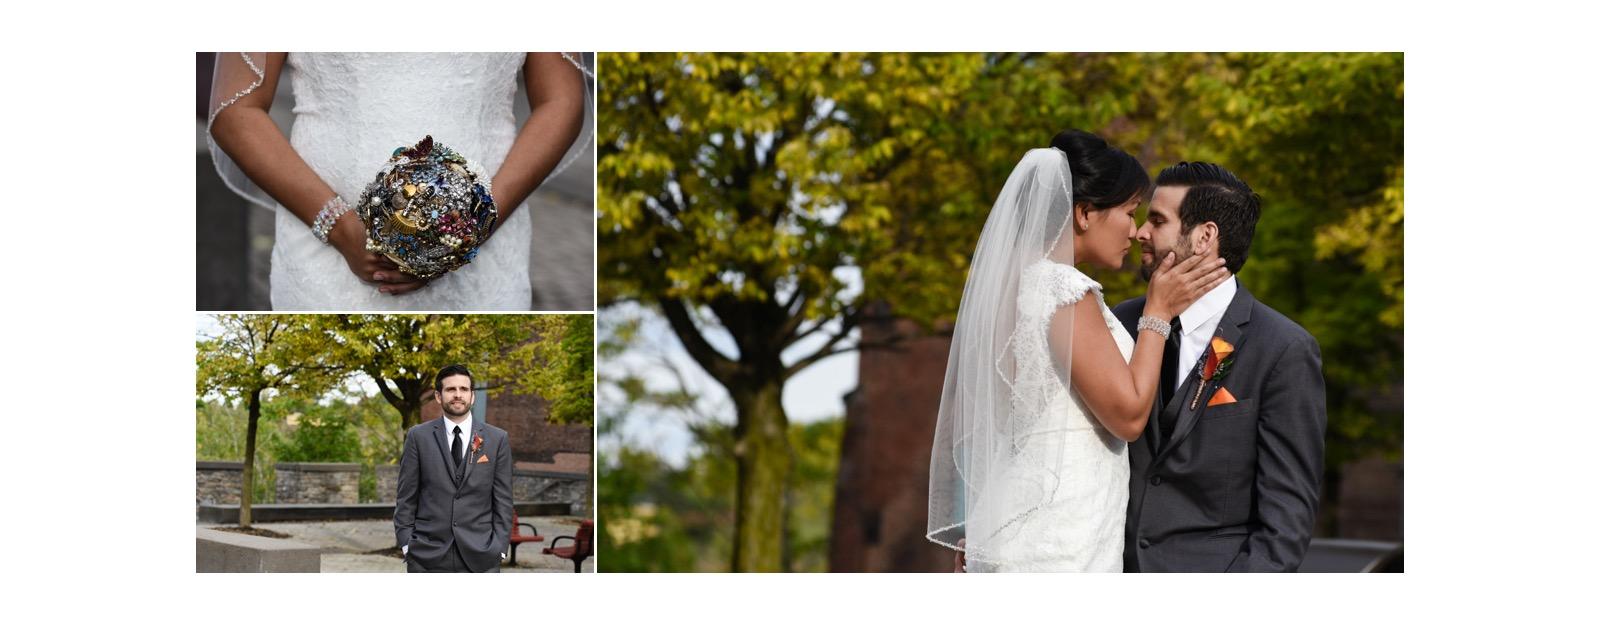 wedding-rochester-woodcliff0013